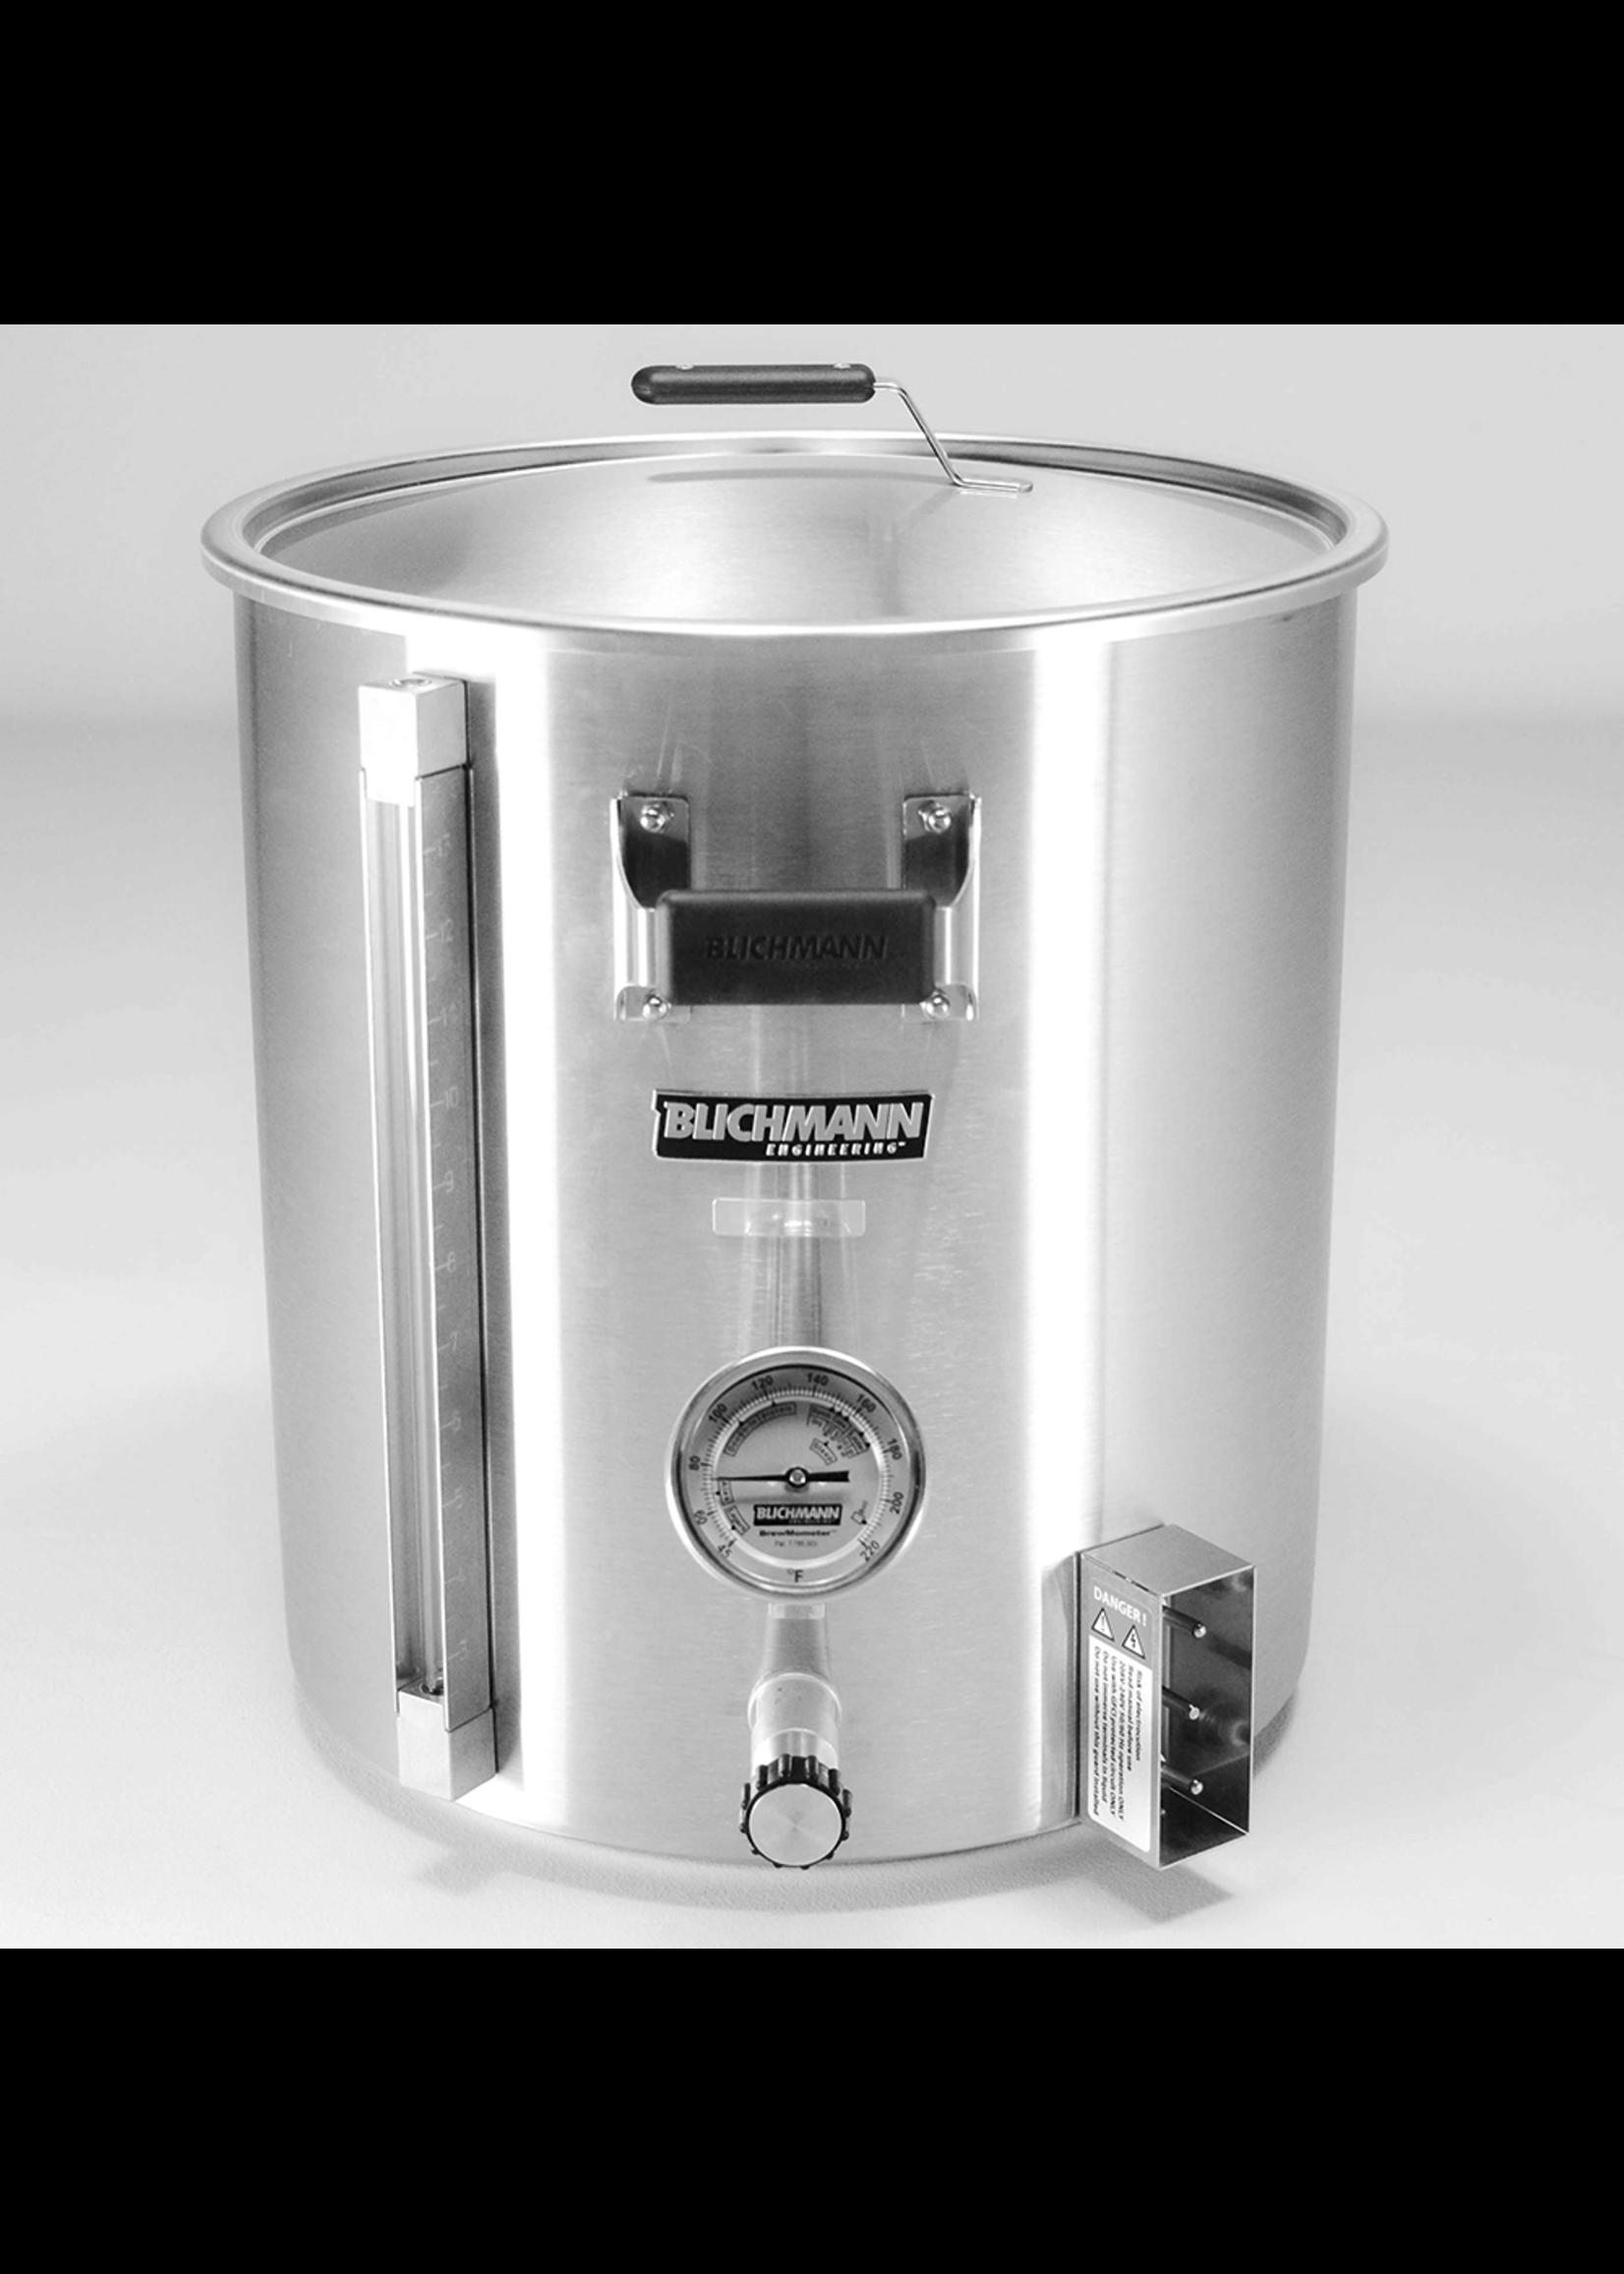 Blichmann Blichmann BoilerMaker G2 - 10 Gallon 120V Electric Brew Kettle (Celsius)